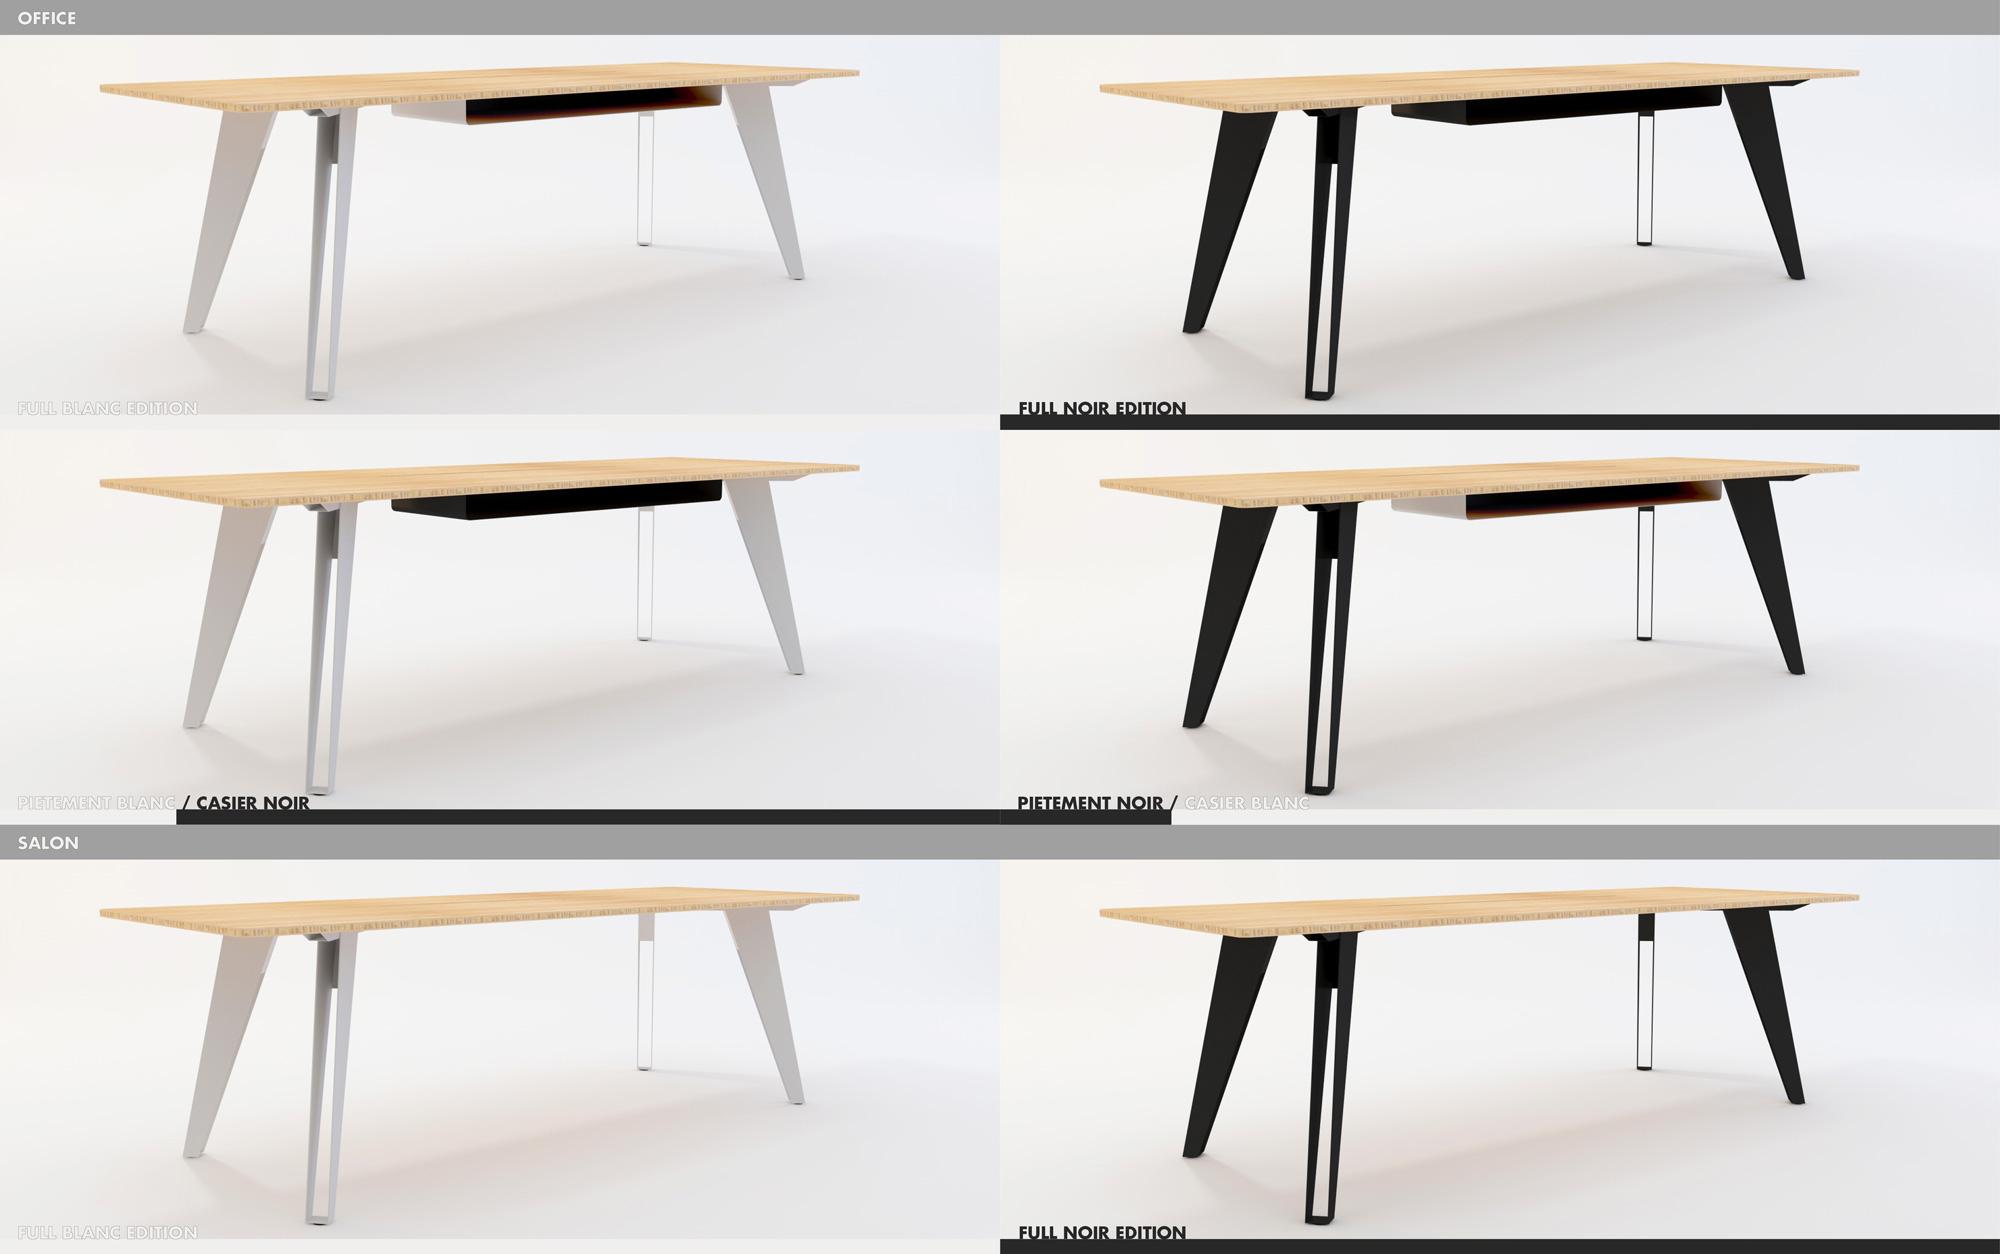 baru-design-bta-table-design-declinaison